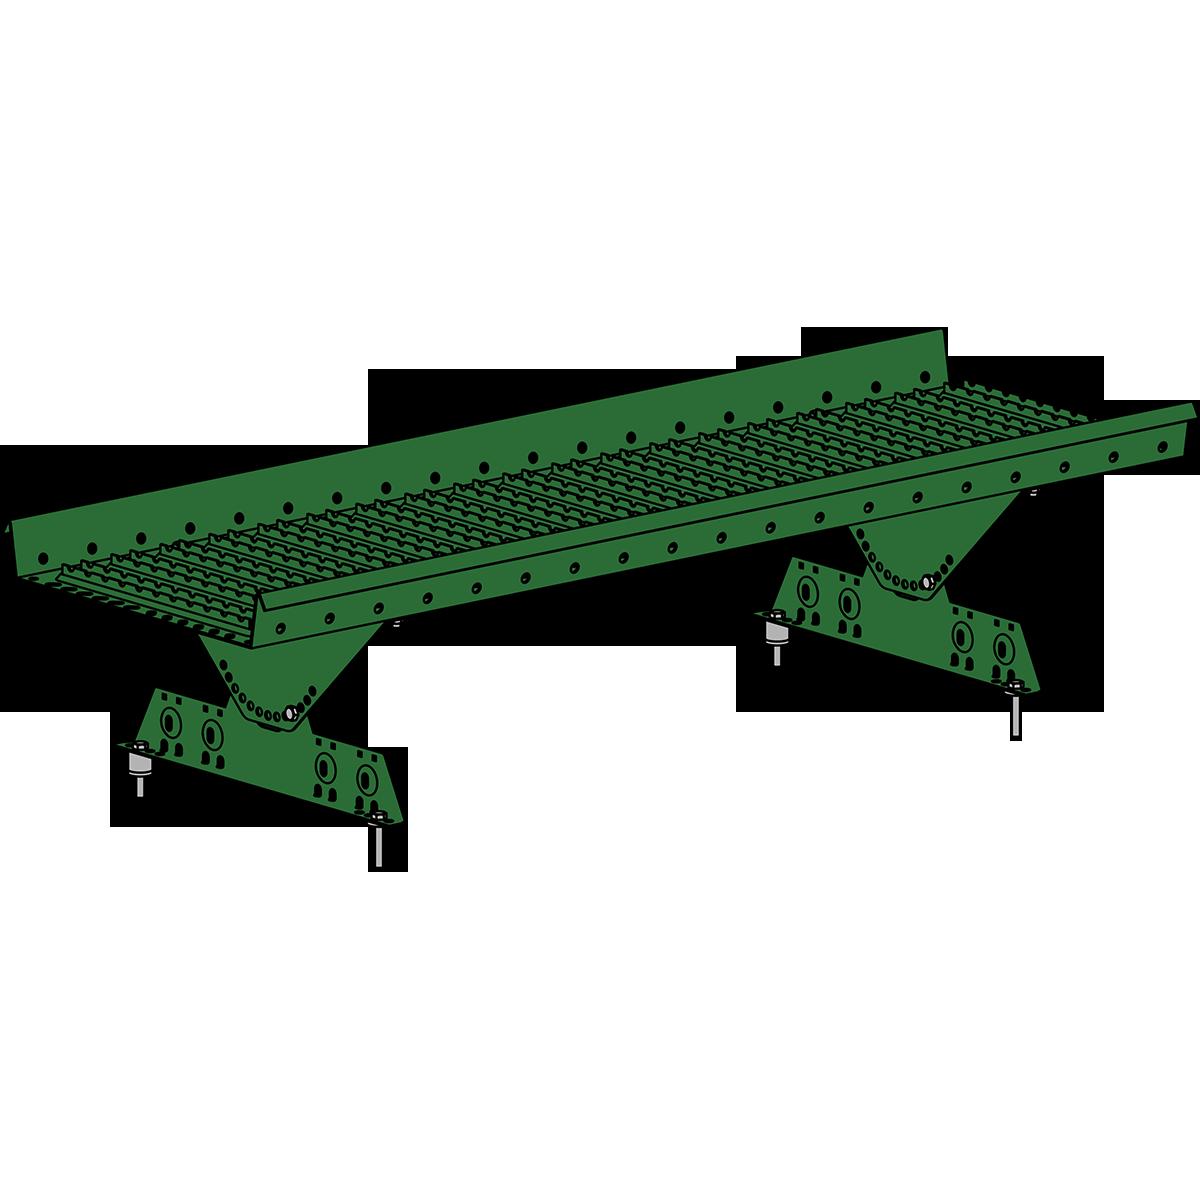 Мостик кровельный ROOFSYSTEMS PRESTIGE ZN 360 NEXT 1,2 м RAL 6002 Зеленый лист